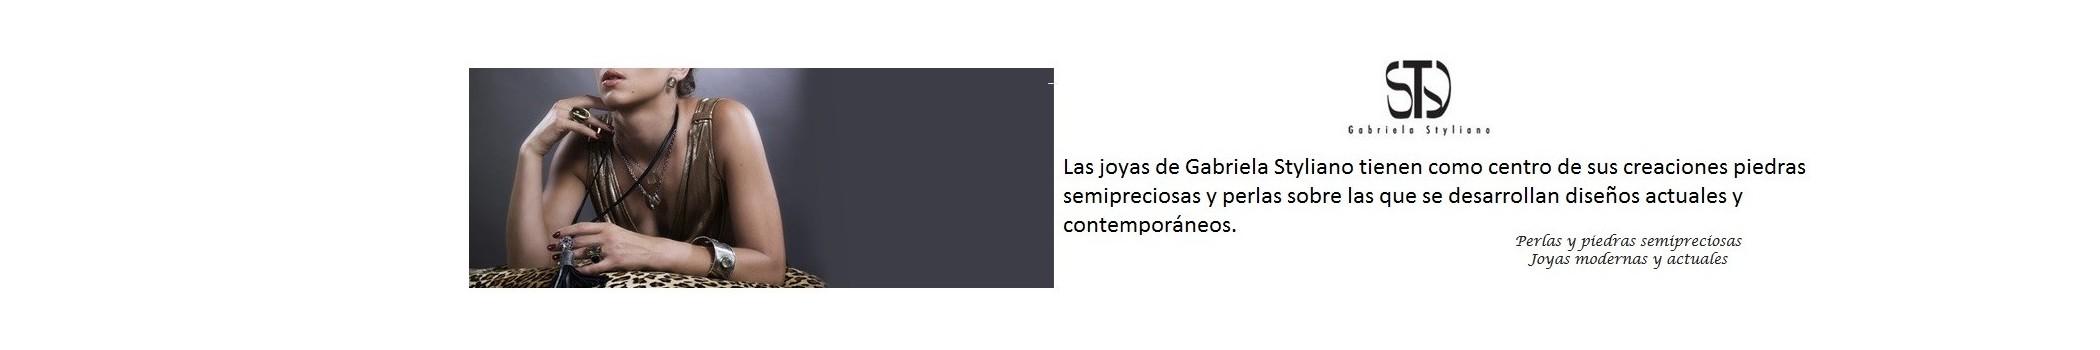 GABRIELA STYLIANO